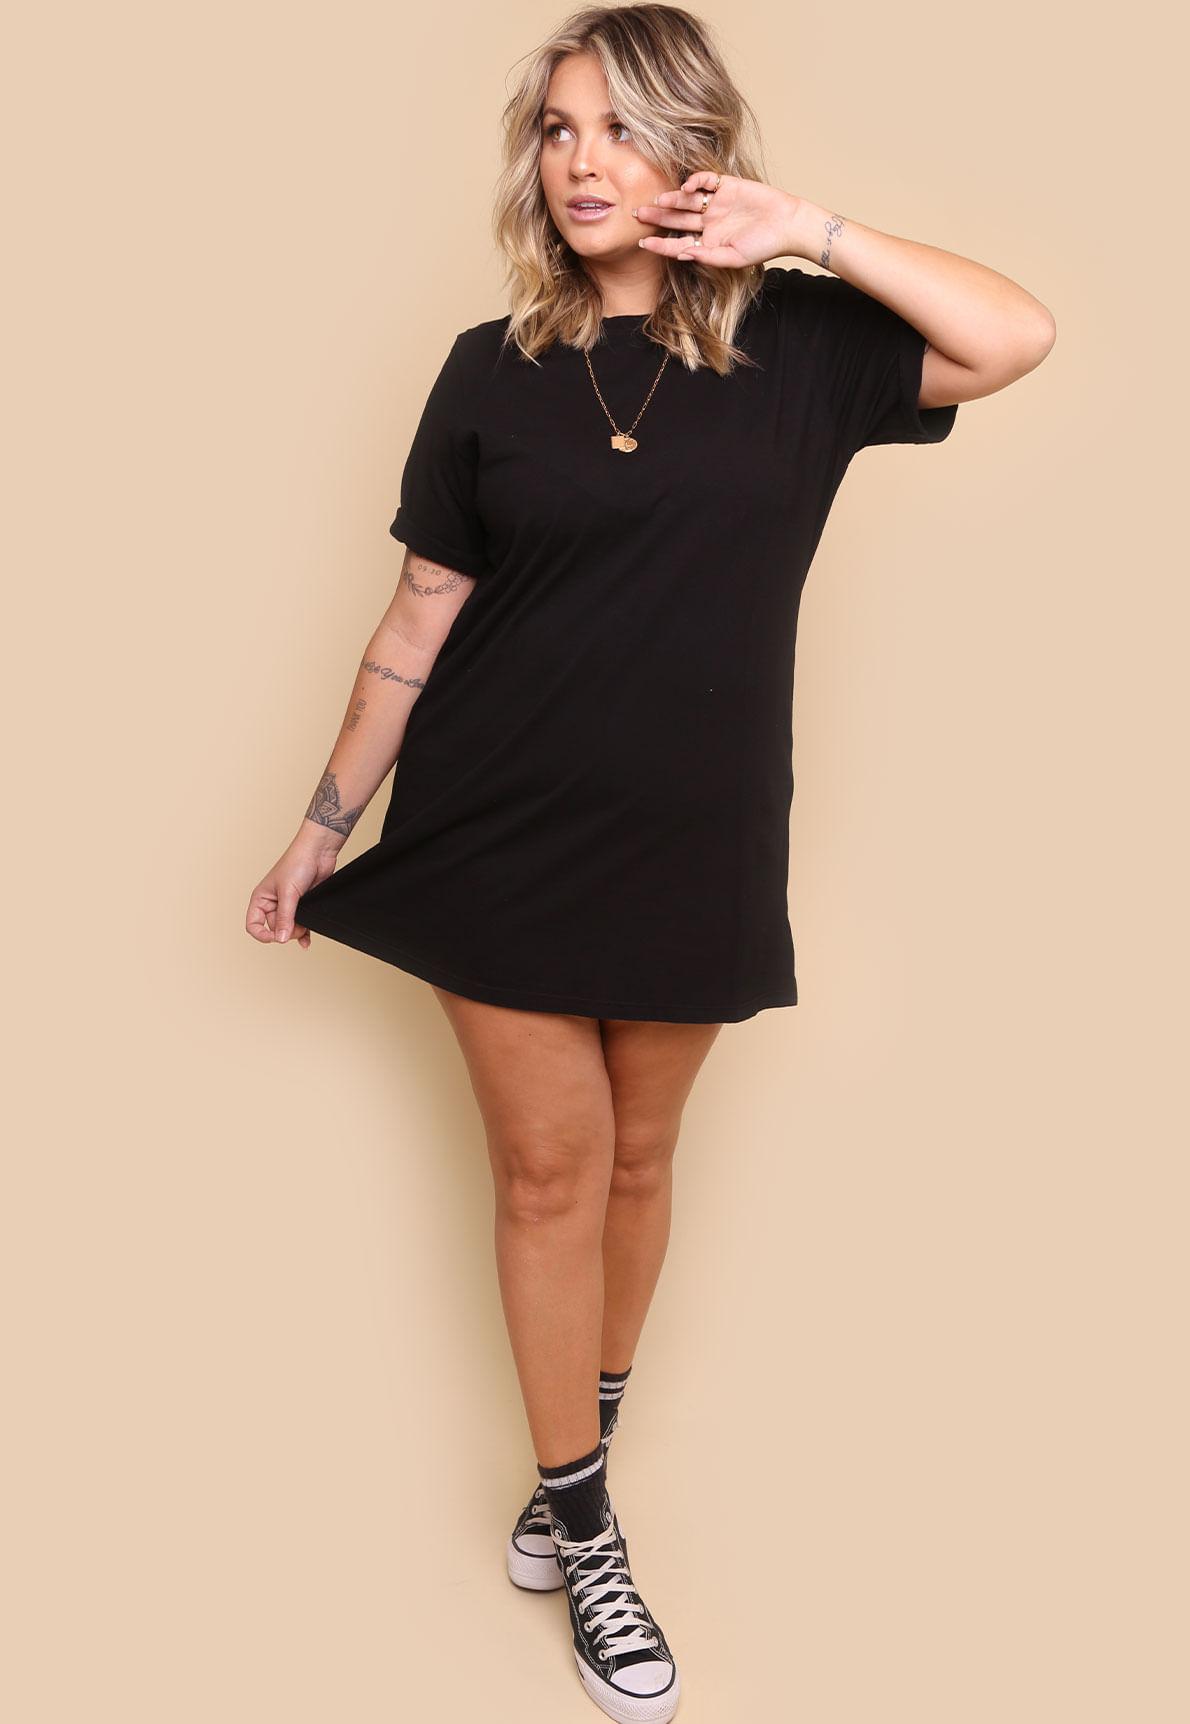 30104-vestido-camiseta-preto-california-days-mundo-lolita-10